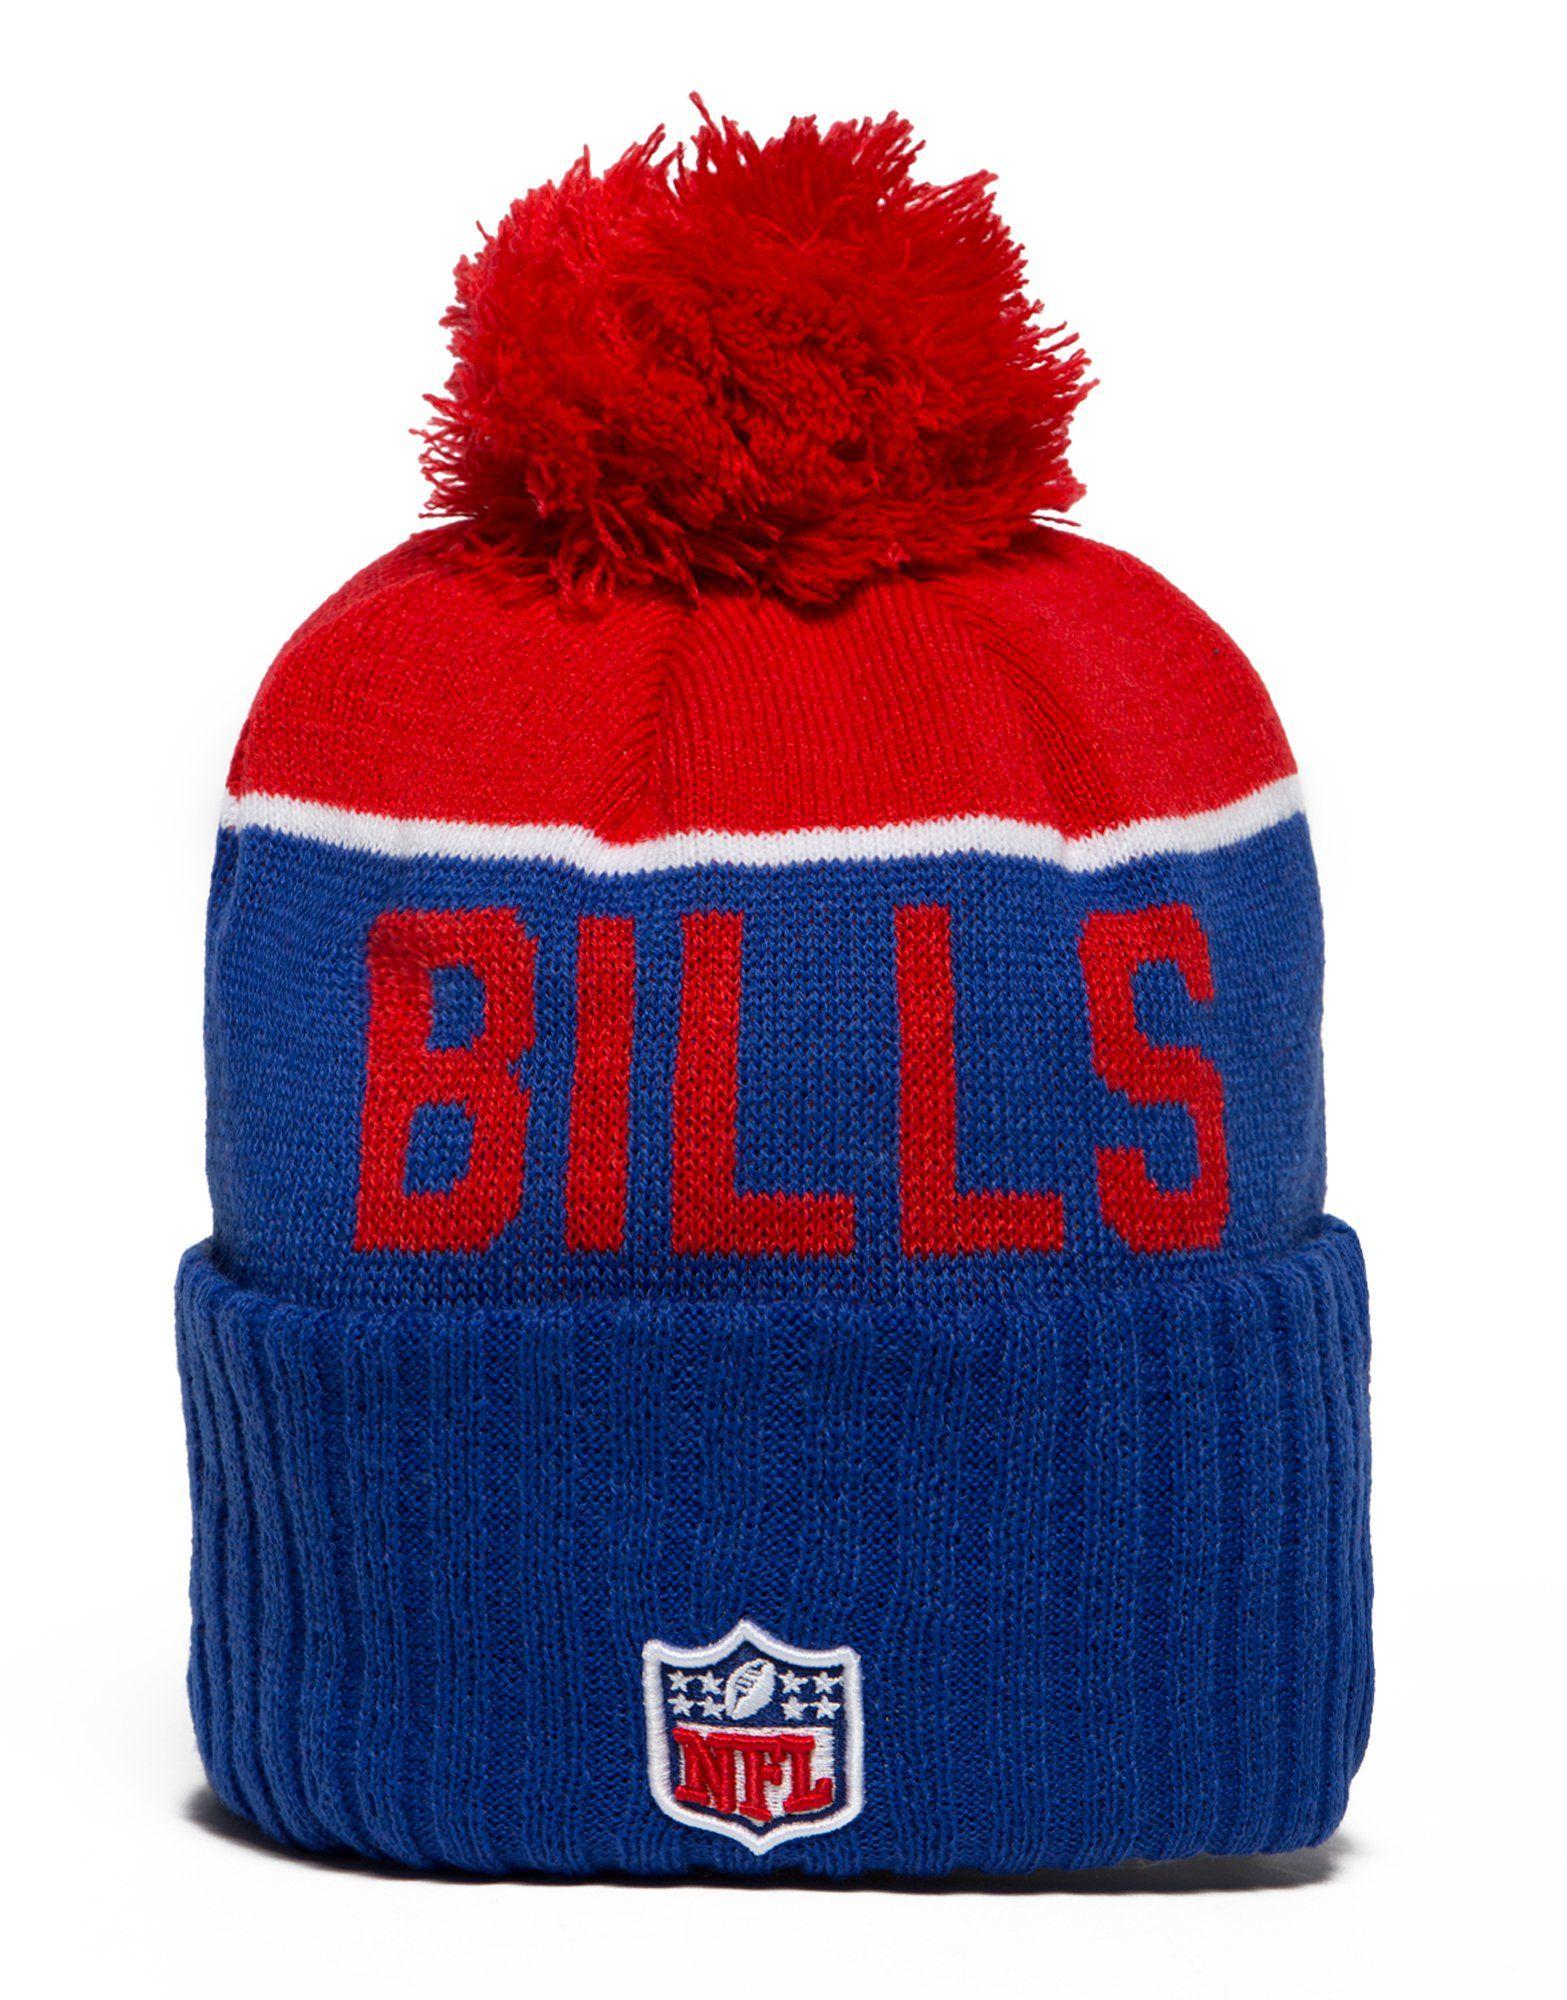 New Era NFL Buffalo Bills Beanie Hat